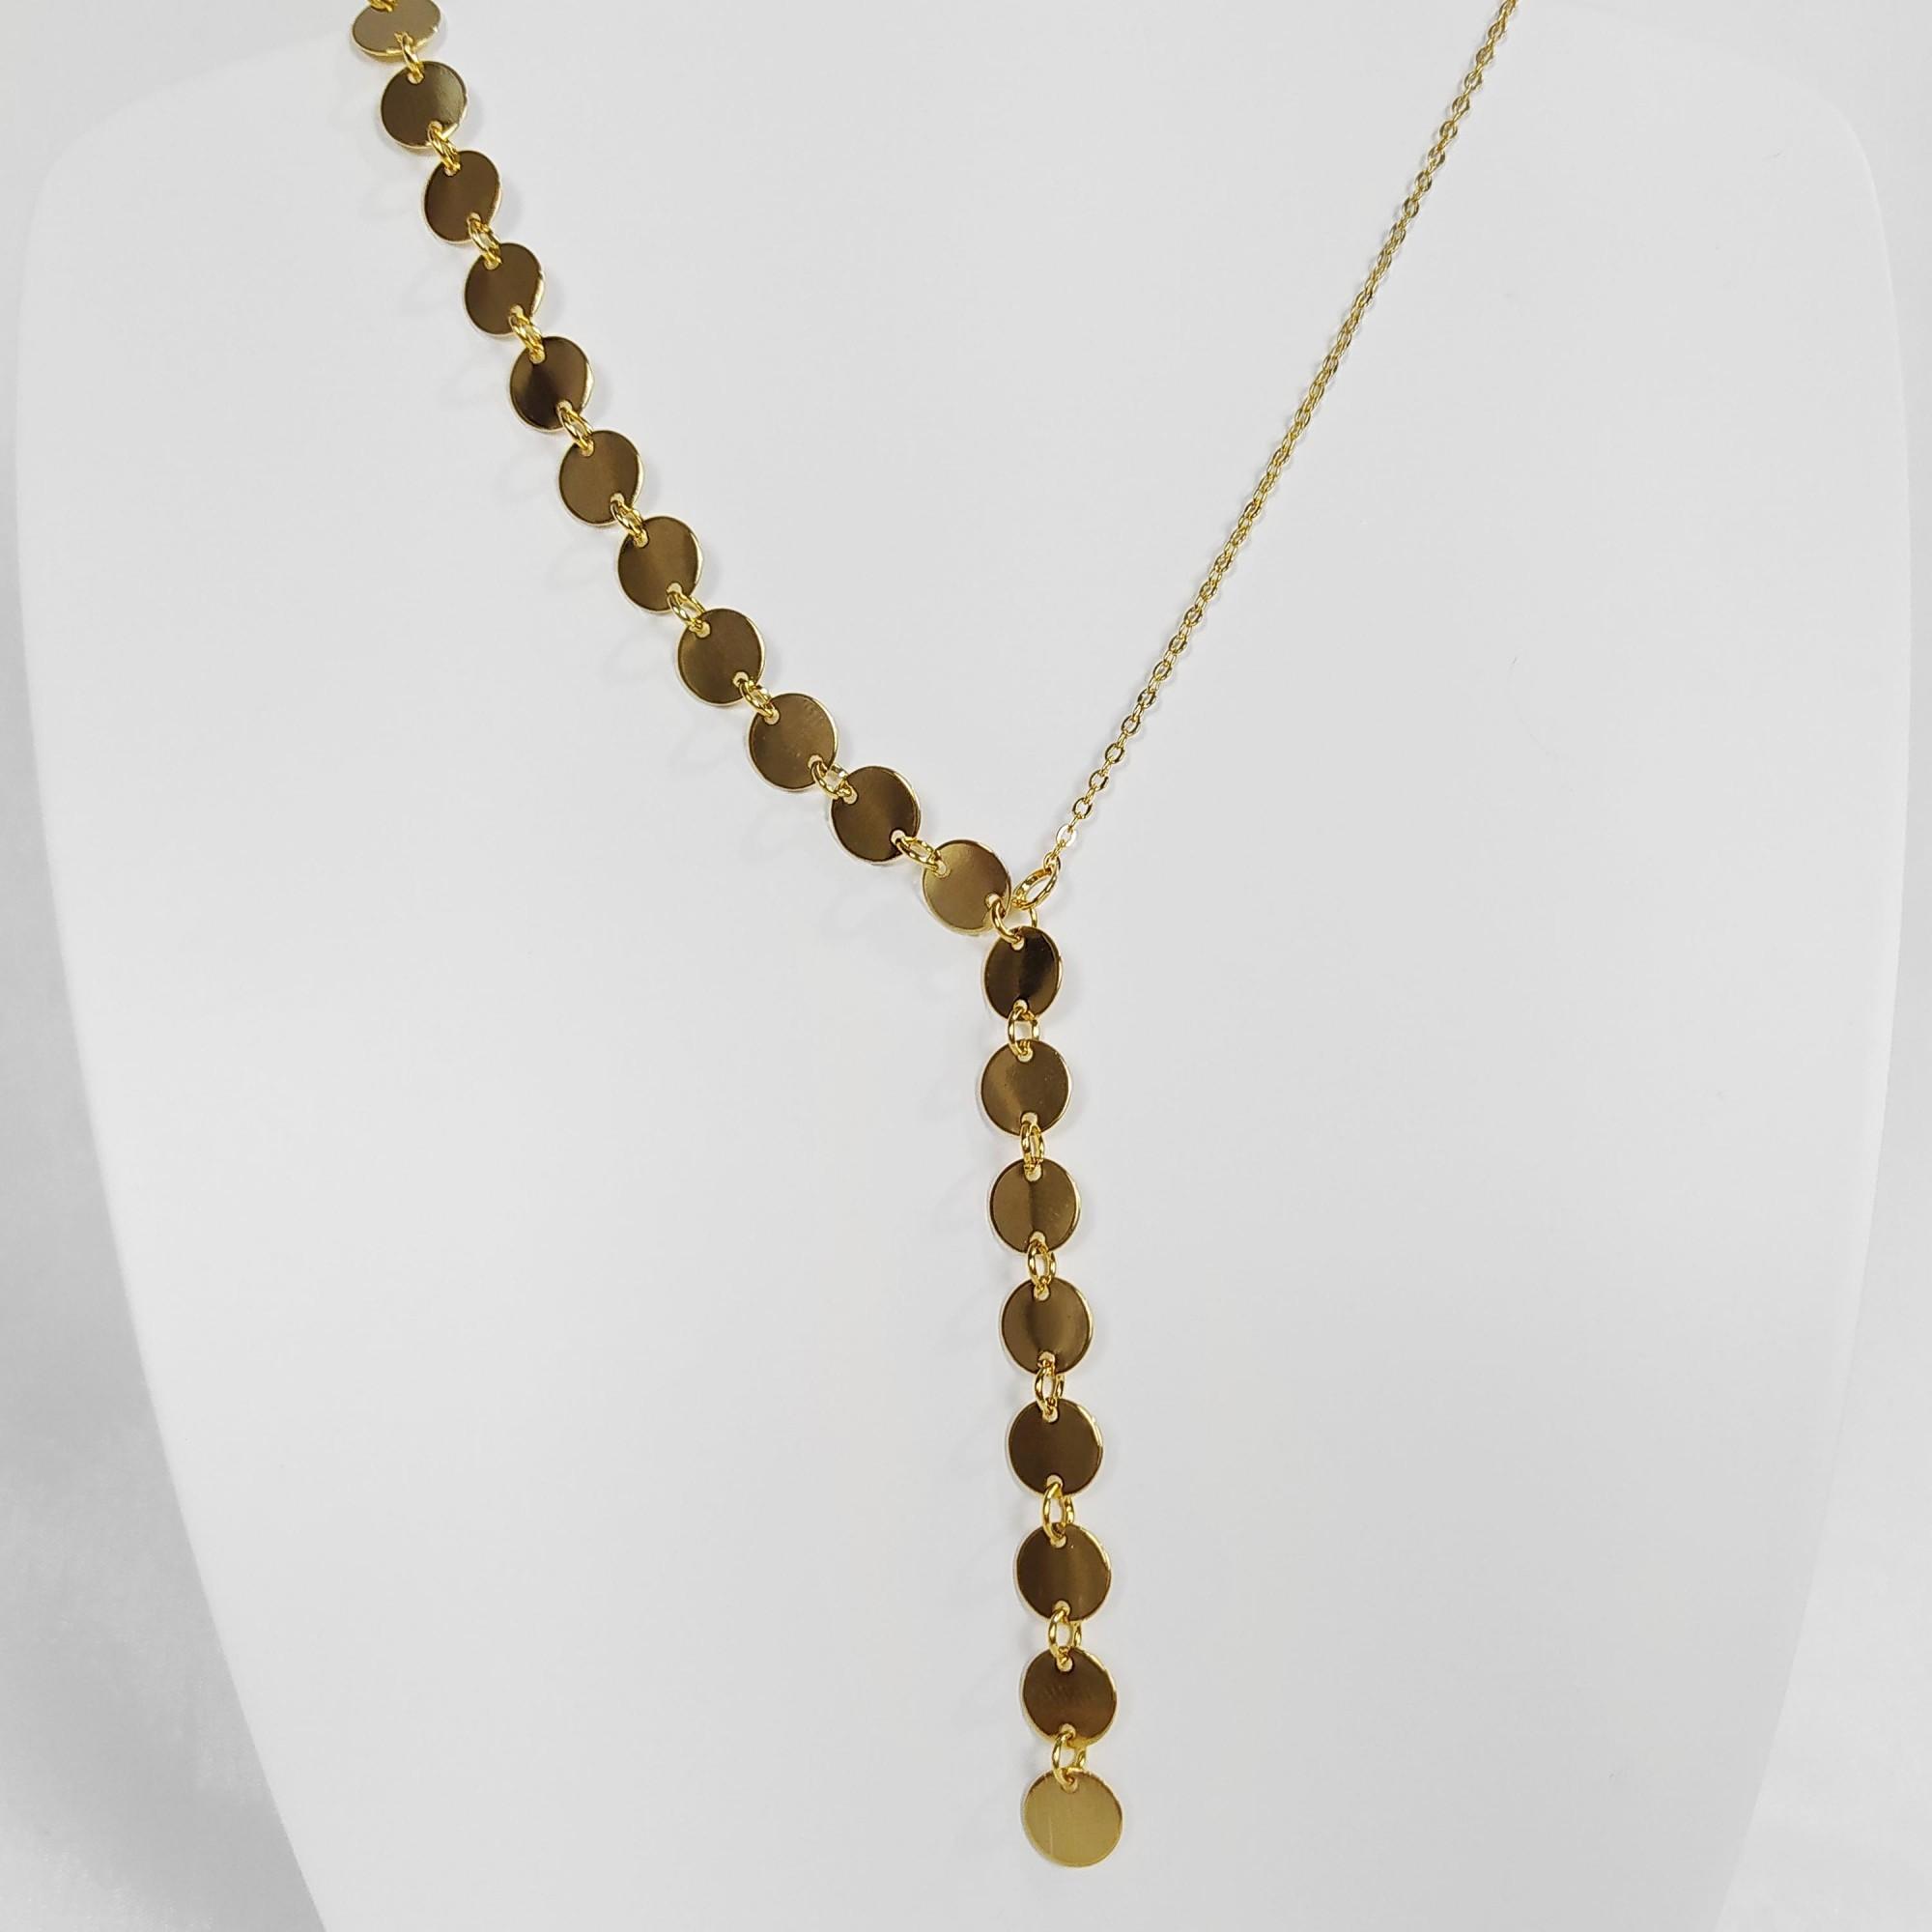 Colar Gravatinha Unilateral Circular Folheado a Ouro 18k  - Lunozê Joias